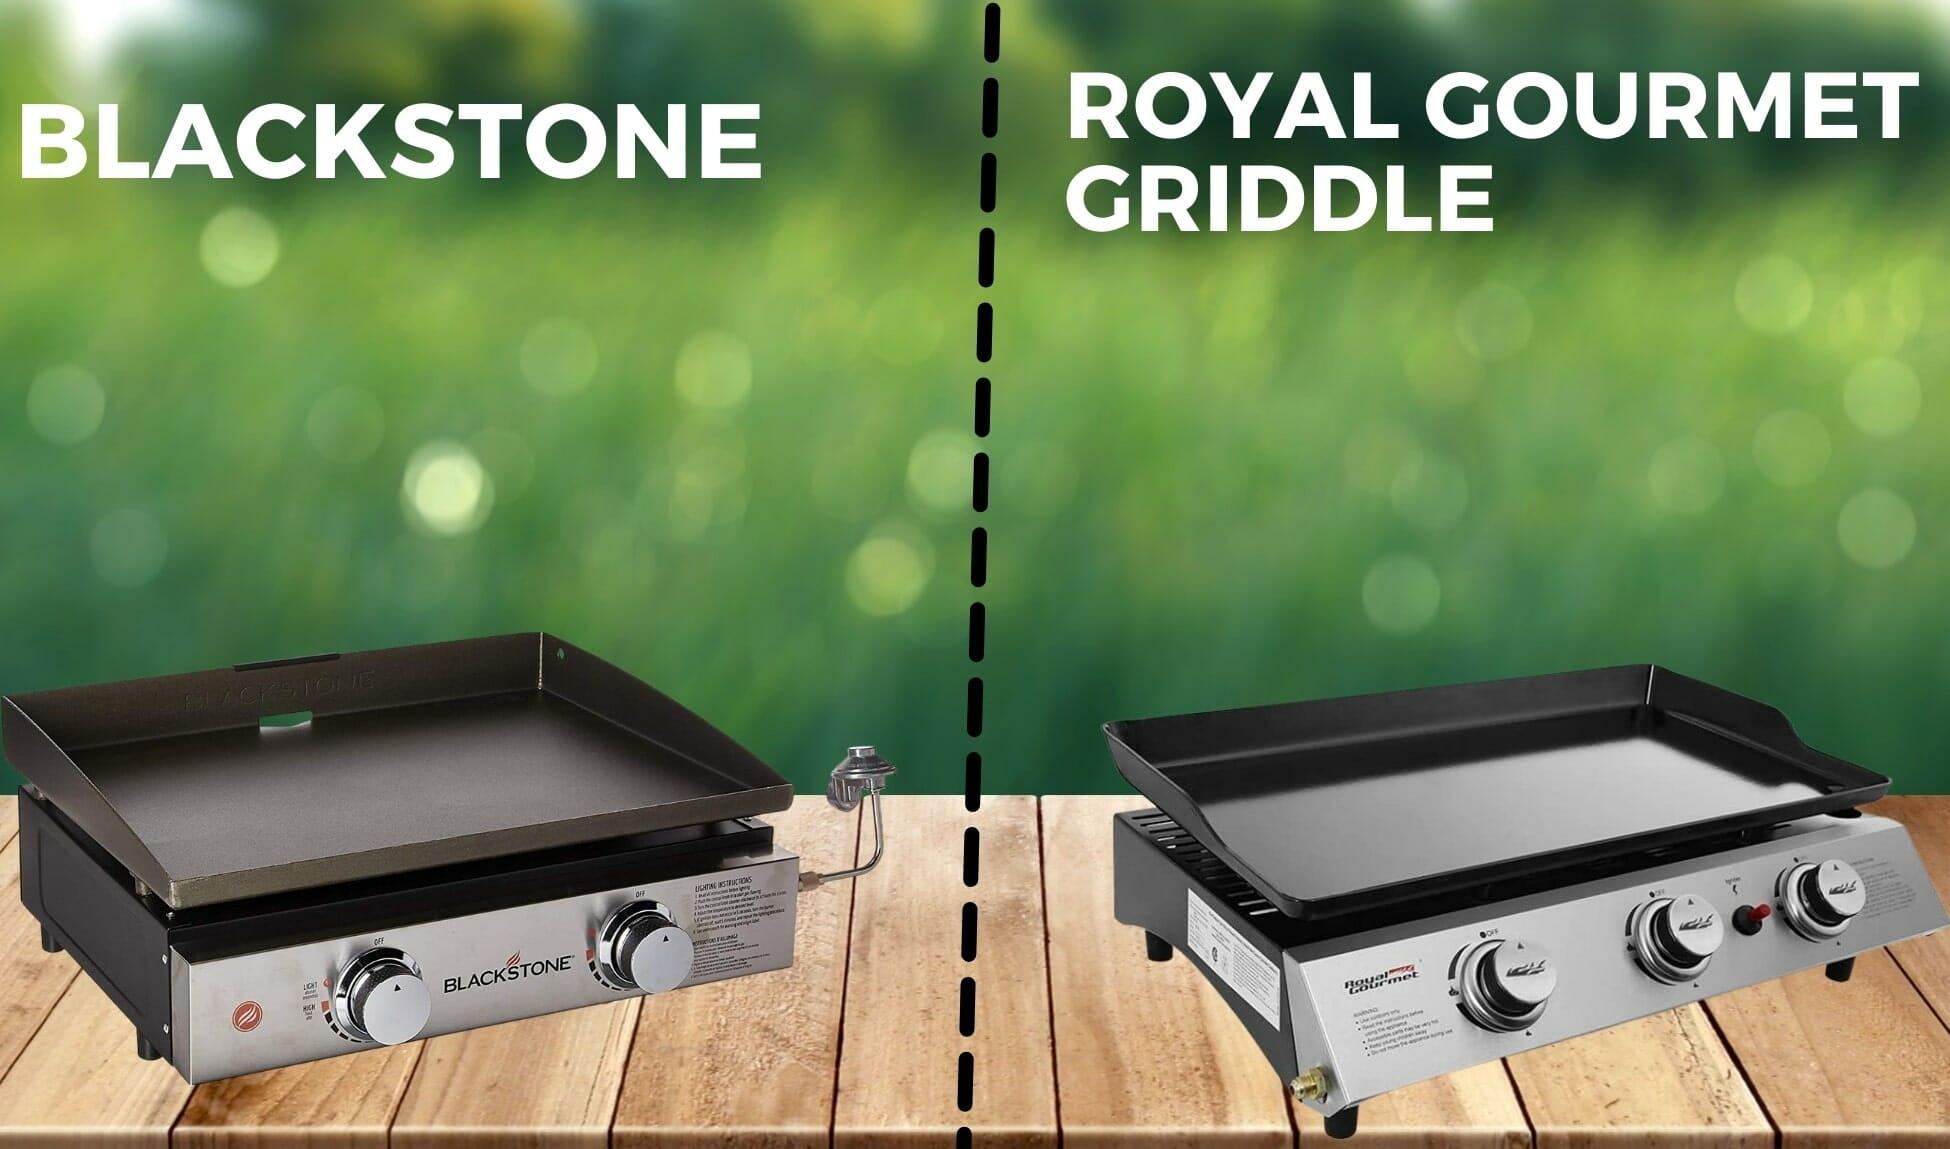 royal gourmet griddle vs blackstone